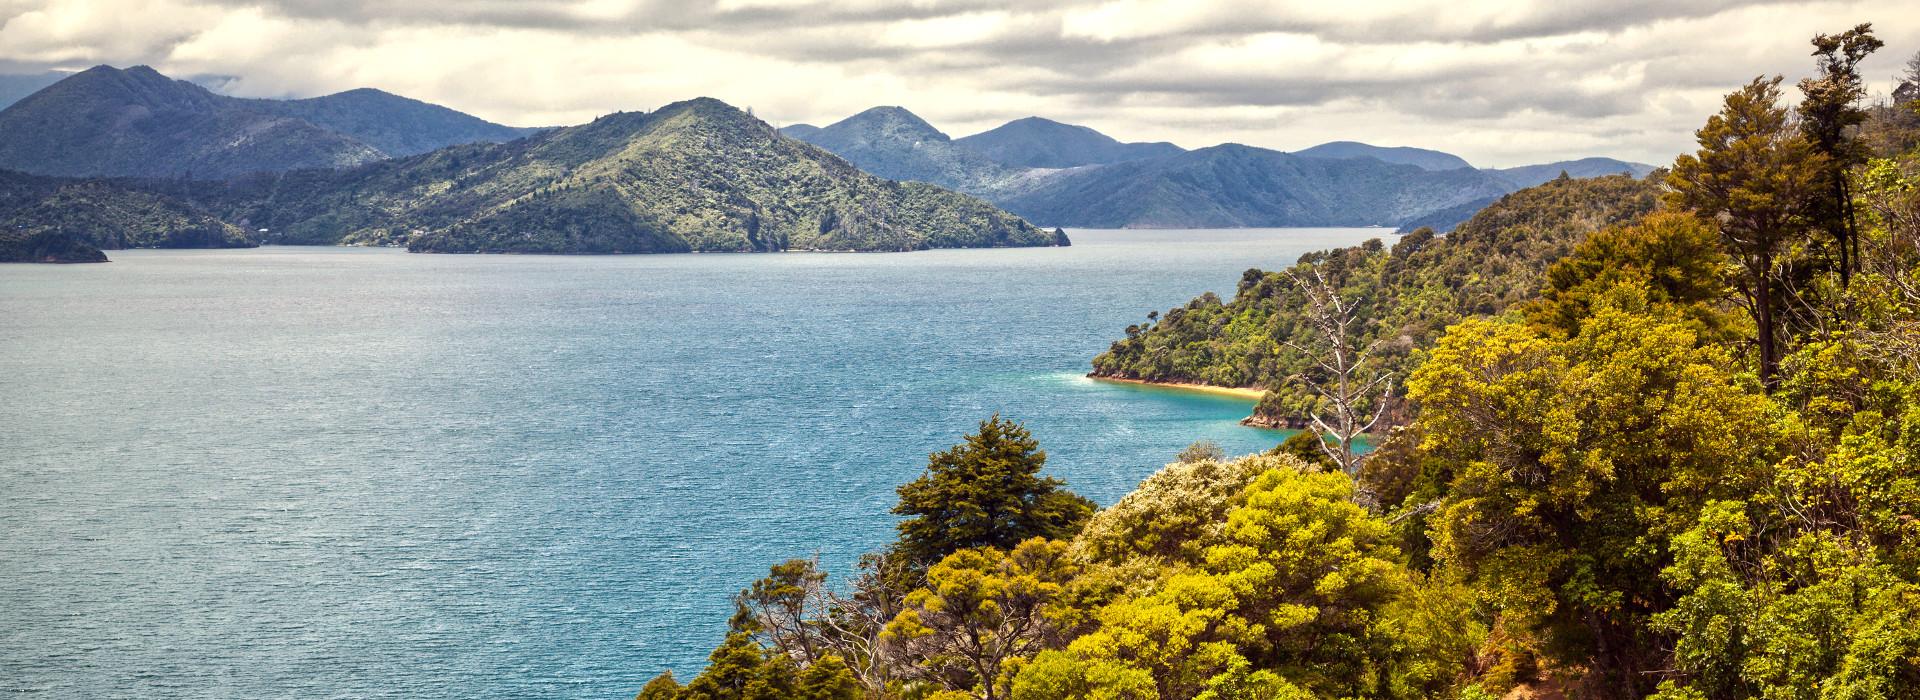 Marlborough Sounds South Island New Zealand